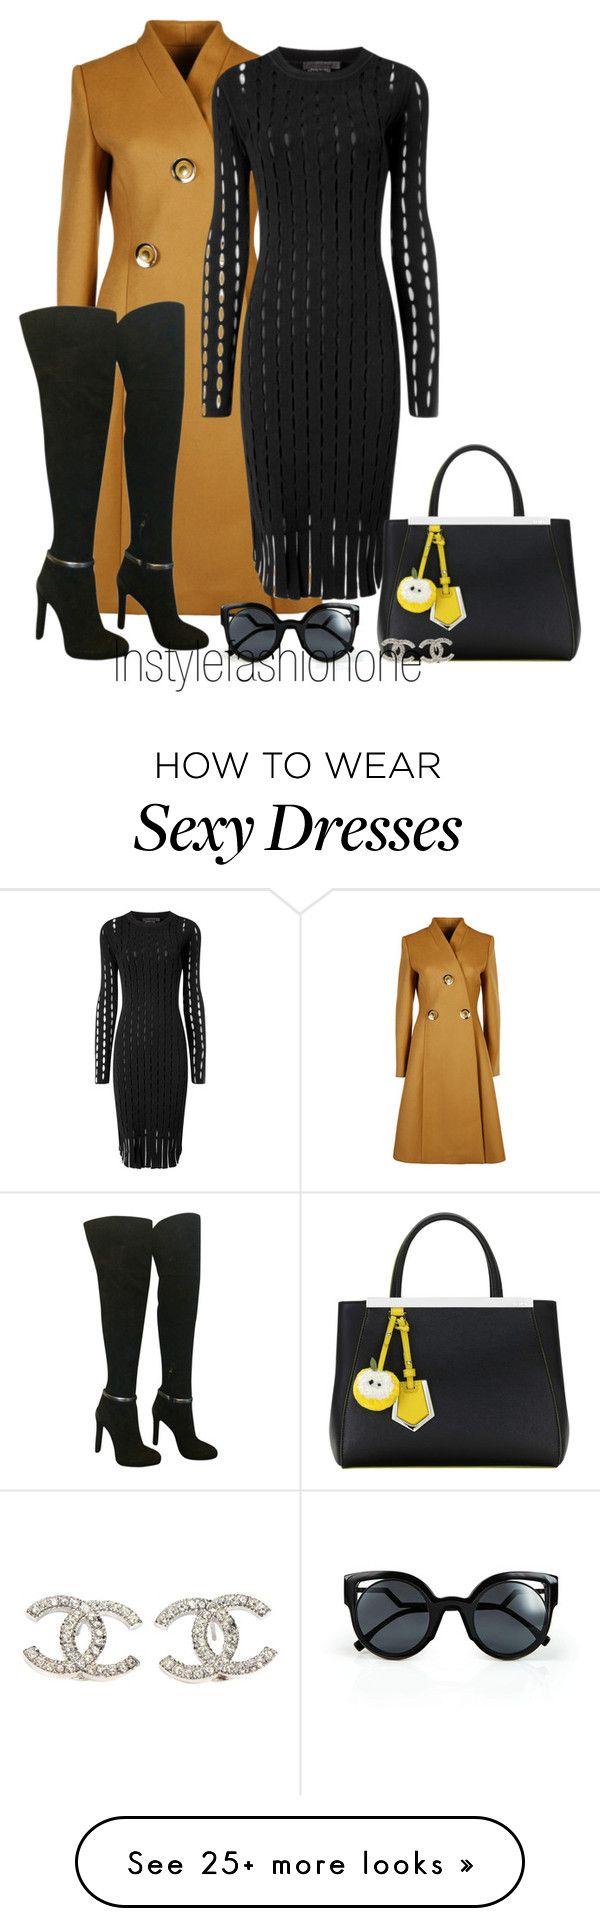 """sexy"" by stylish1475 on Polyvore featuring moda, STELLA McCARTNEY, Alexander Wang, Fendi, Chanel, women's clothing, women, female, woman y misses"